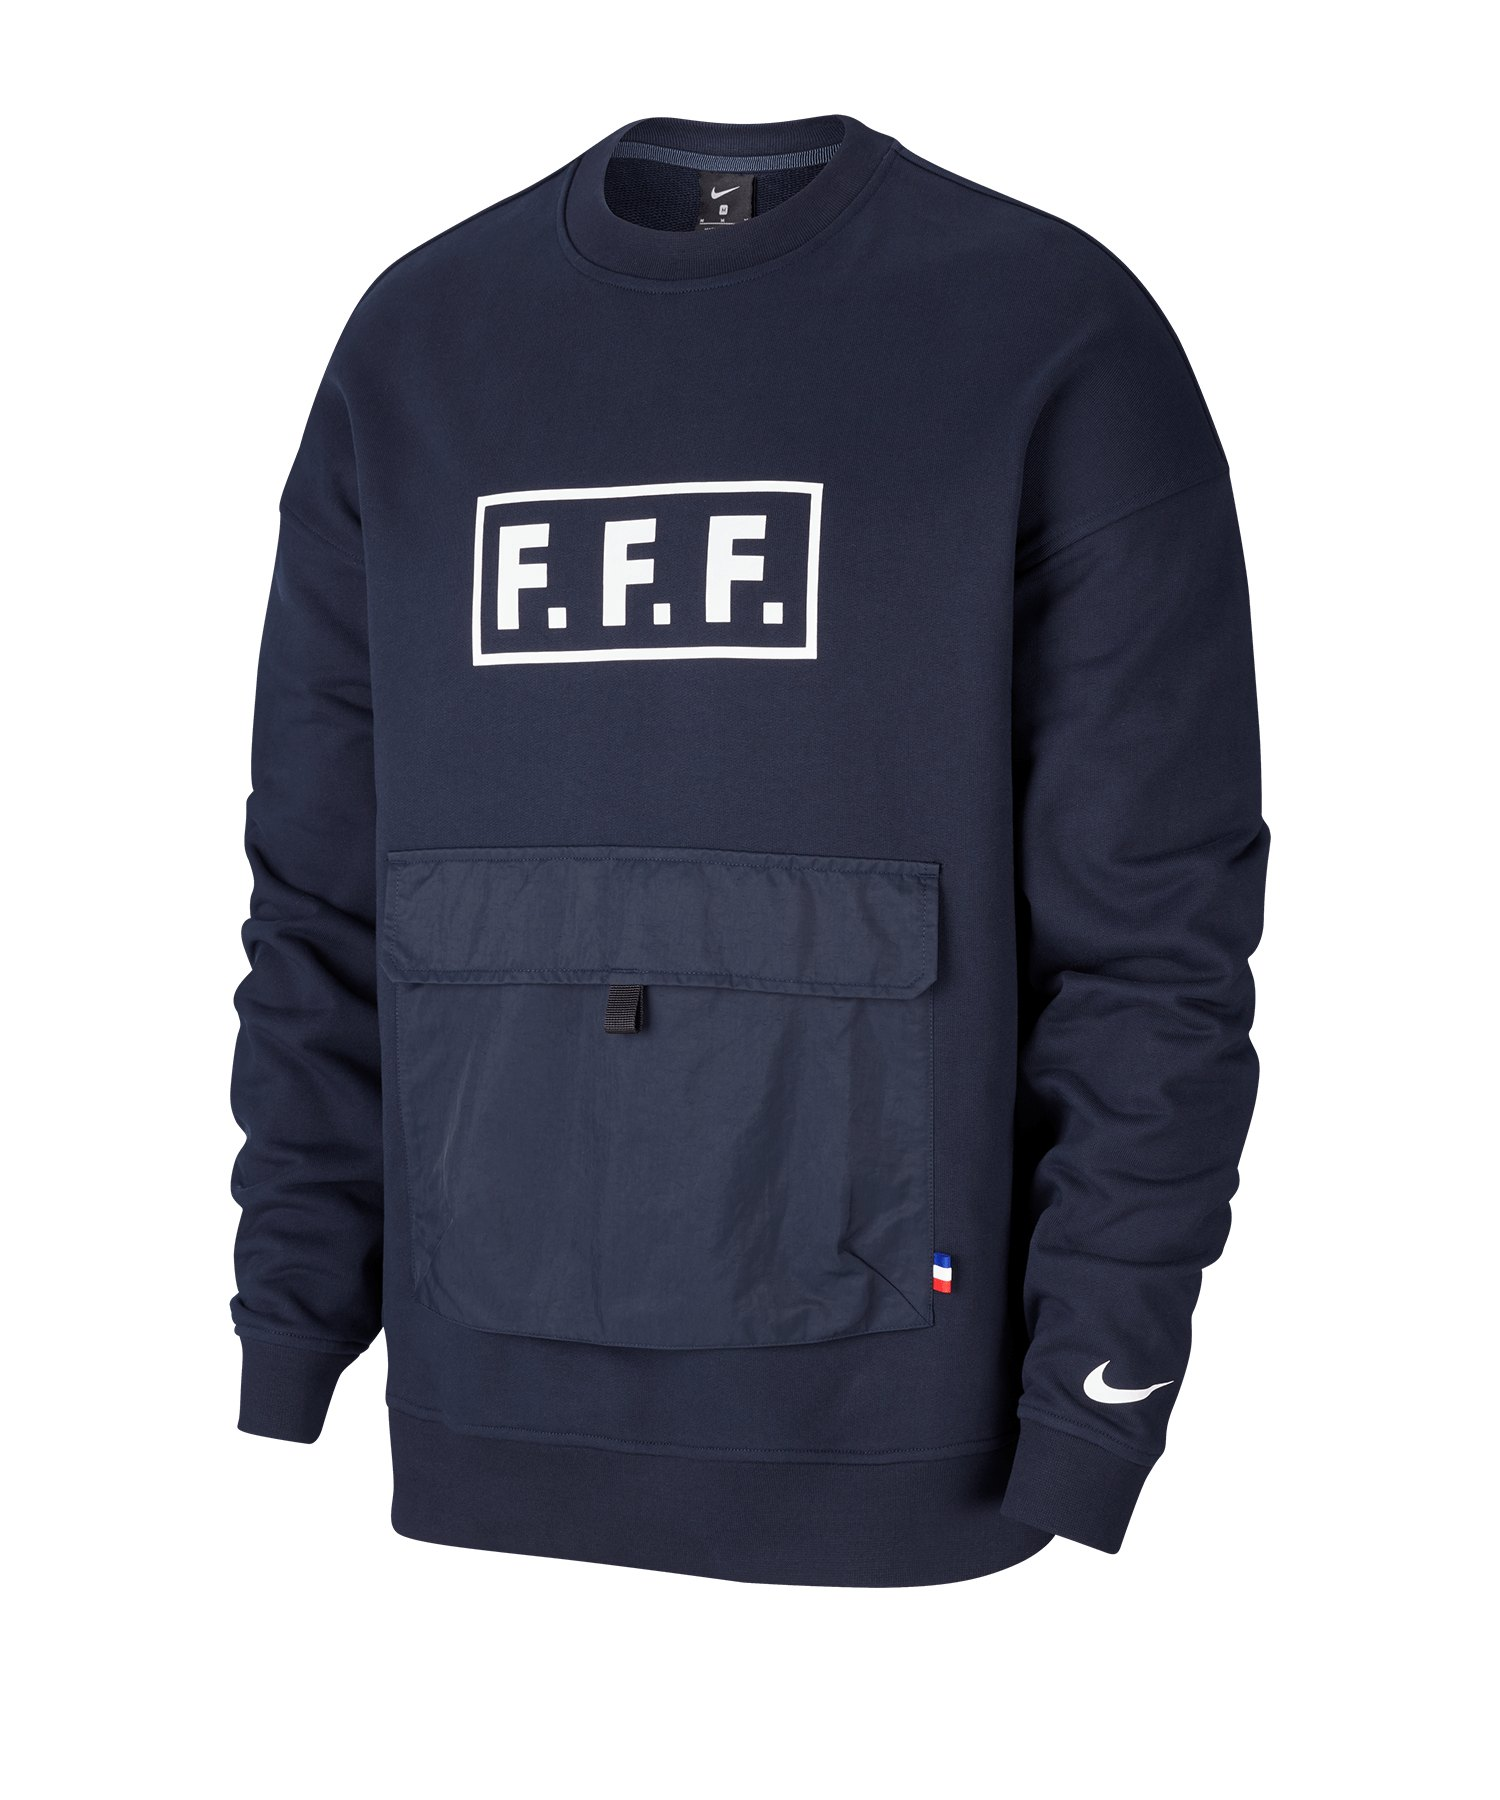 Nike Frankreich Quest Fleece Shirt langarm F475 - schwarz